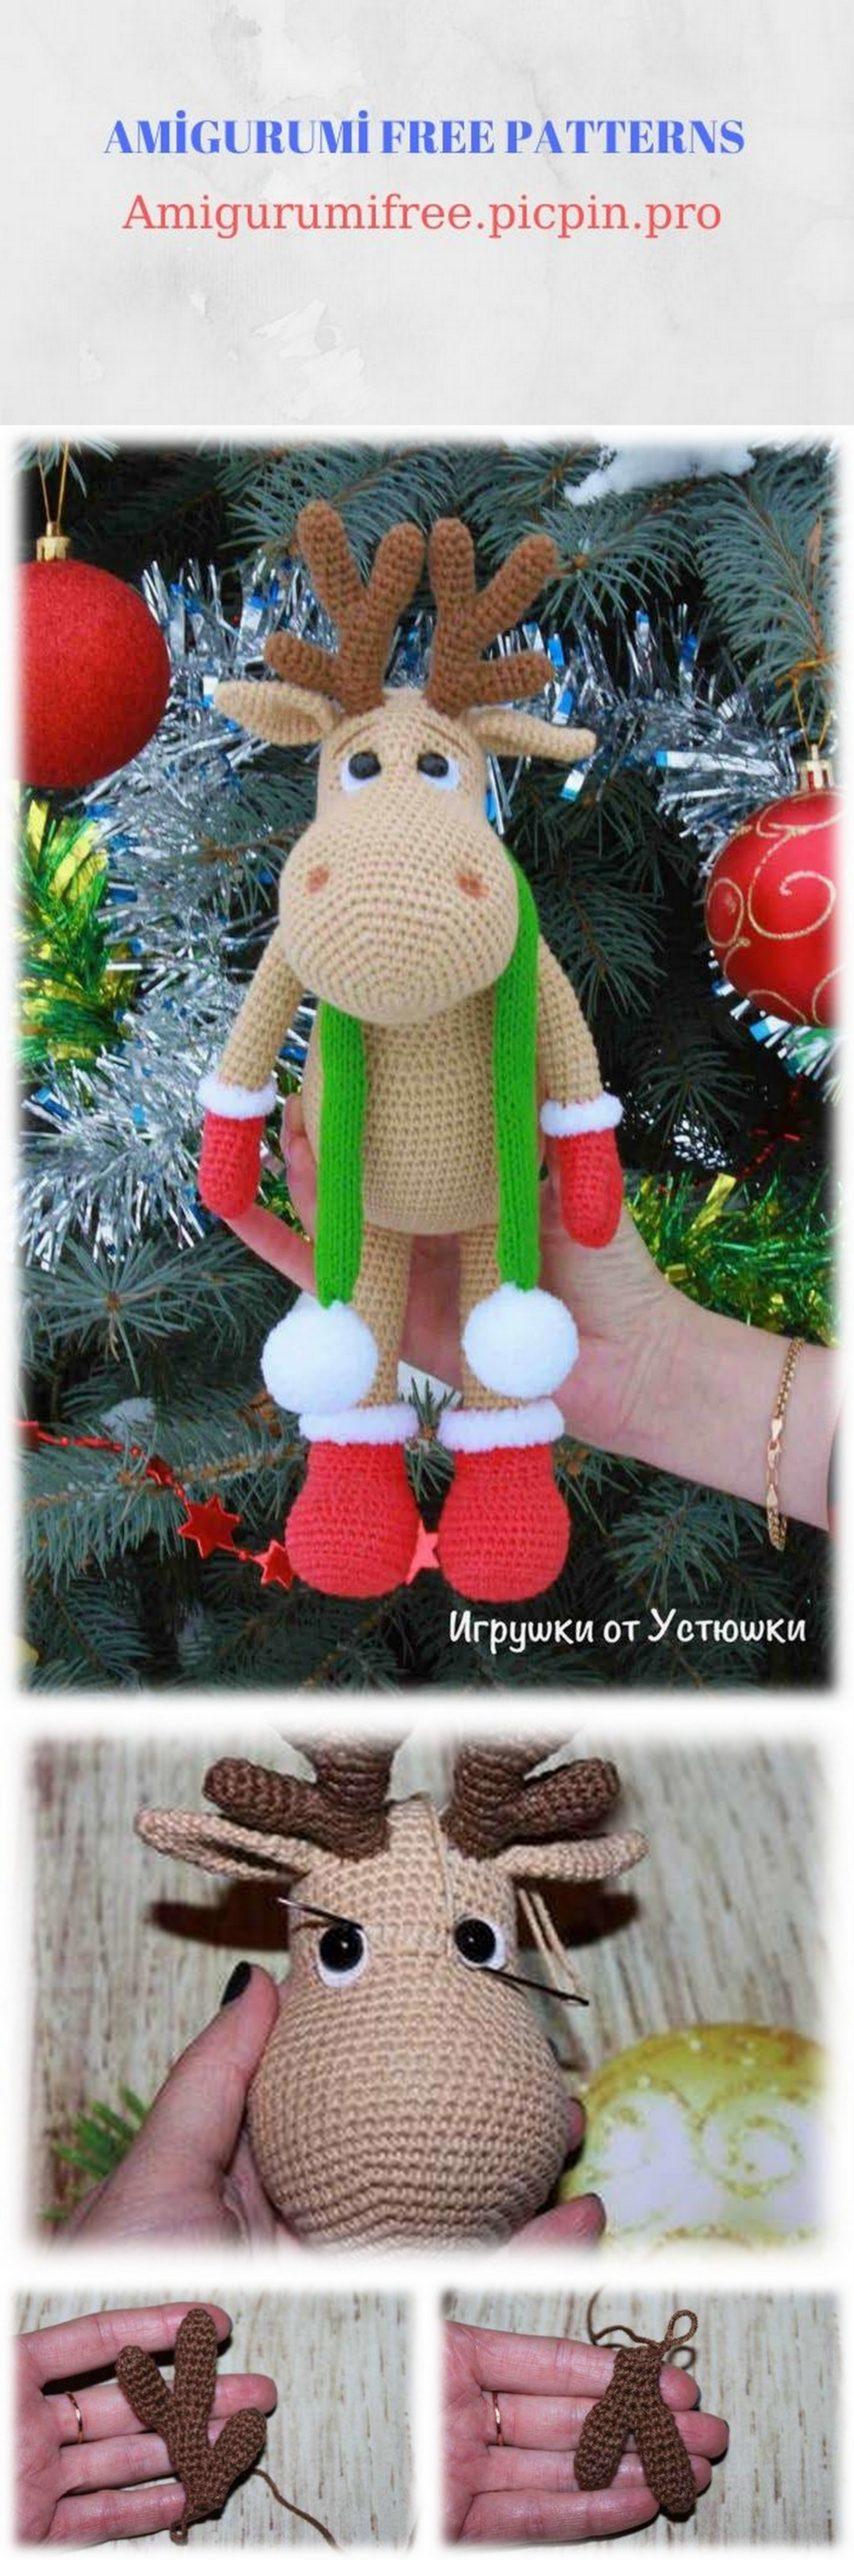 Amigurumi Ruby & Rudolph the Reindeer Crochet Free Pattern ...   2560x854